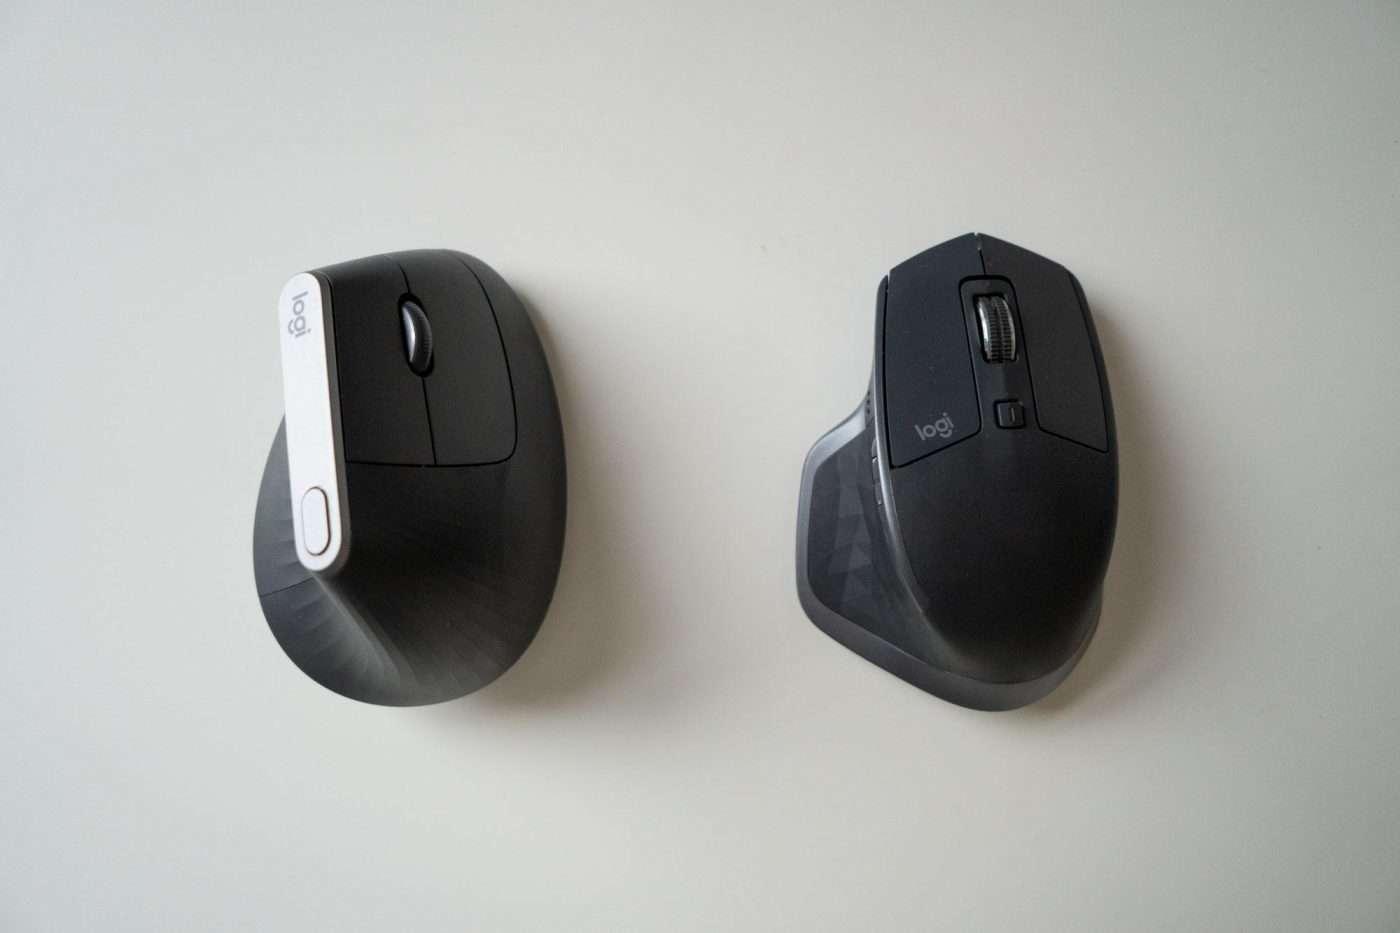 Sore wrists? Logi's MX Vertical mouse can help